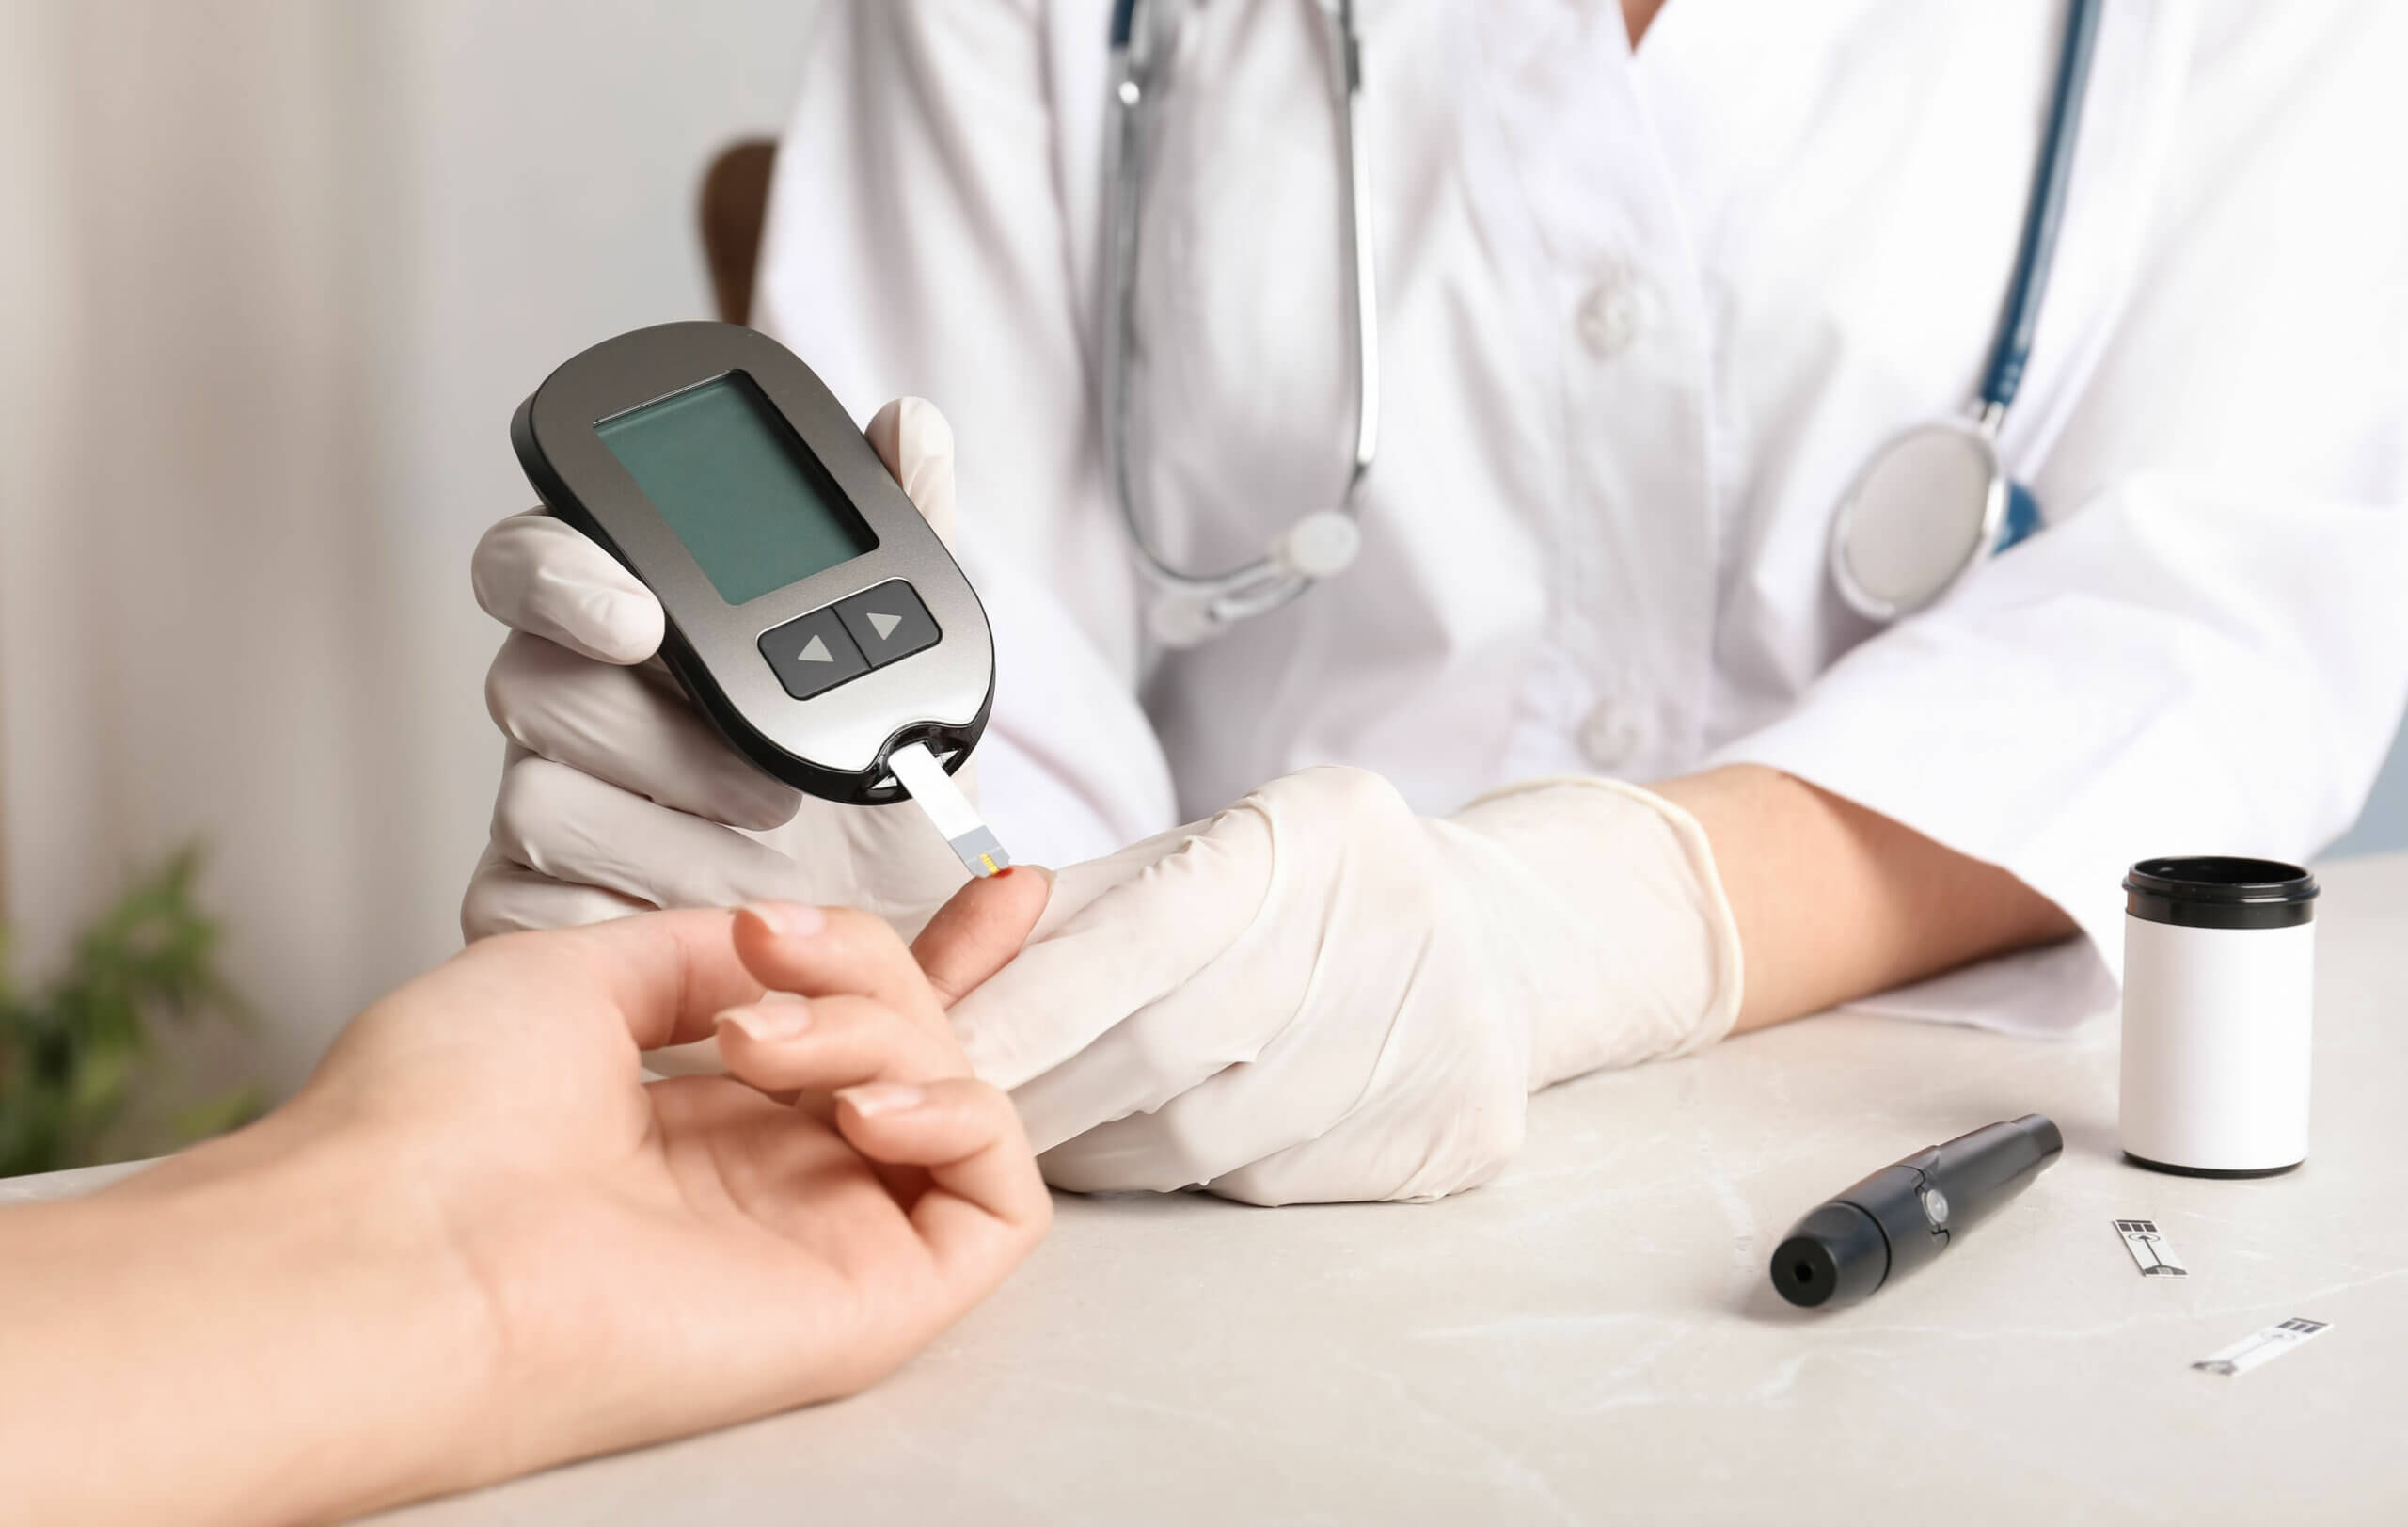 Cómo se diagnostica la hipoglucemia